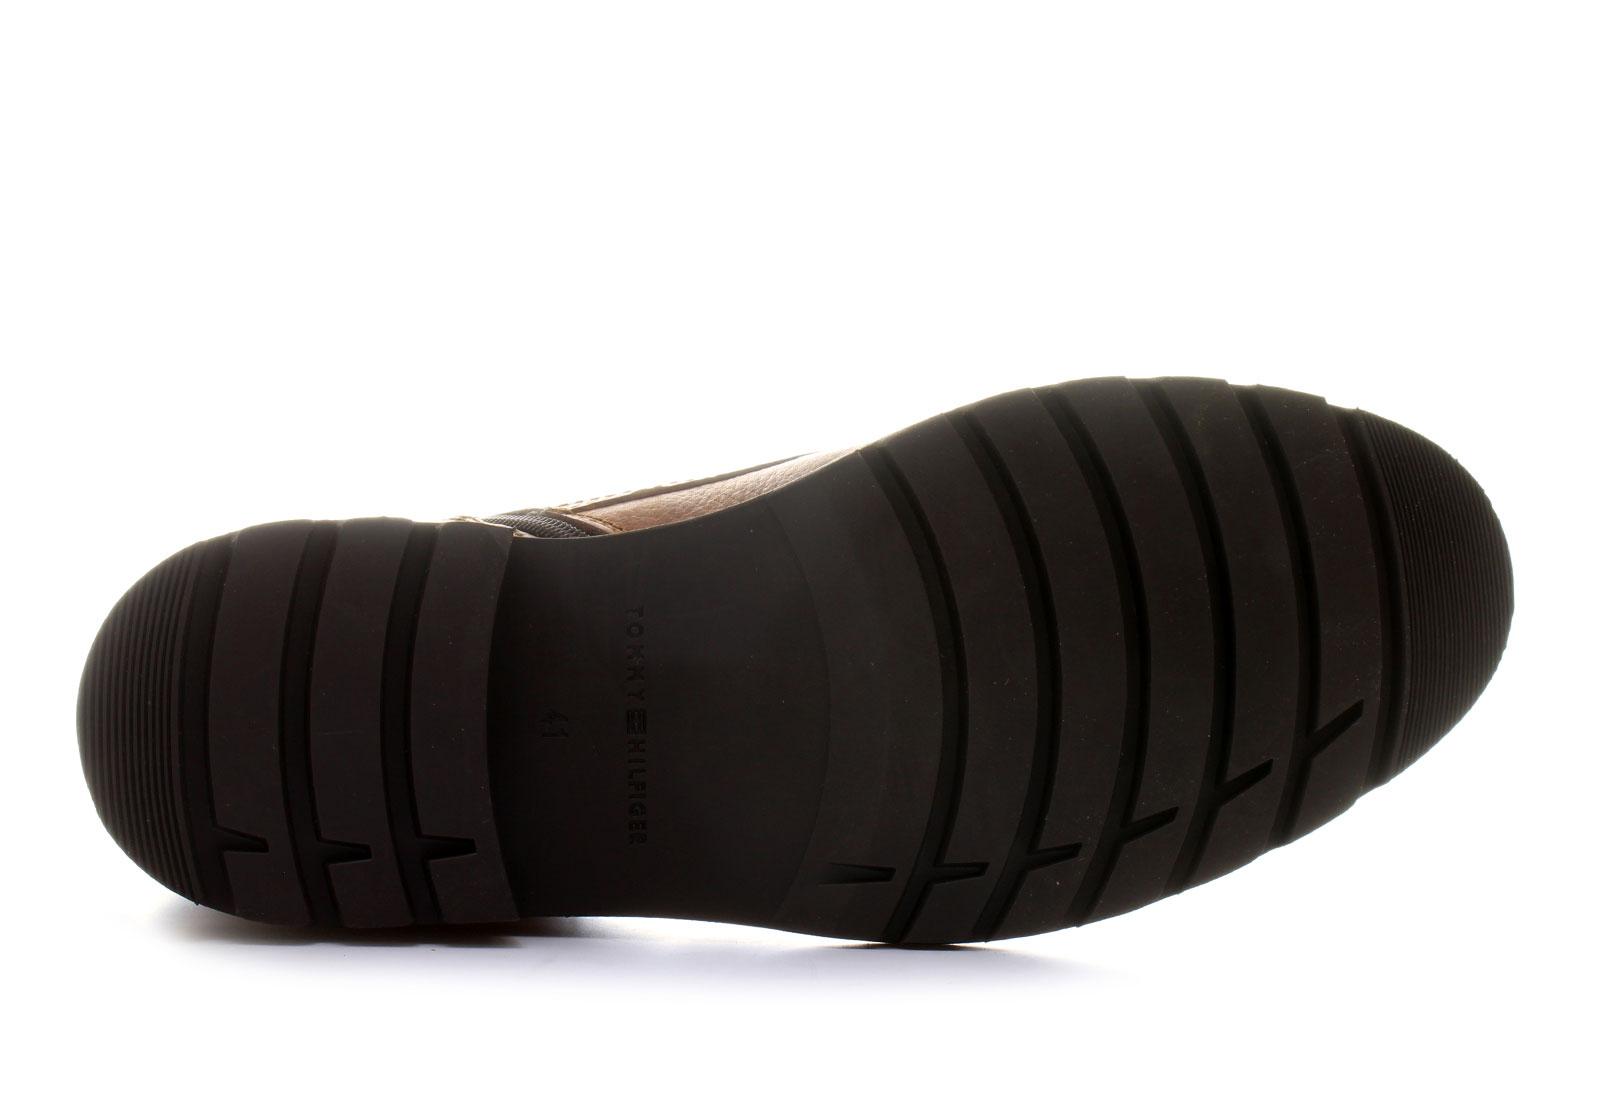 Tommy Hilfiger Bakancs - Curtis 13a - 16F-1742-906 - Office Shoes ... 9146ce1274